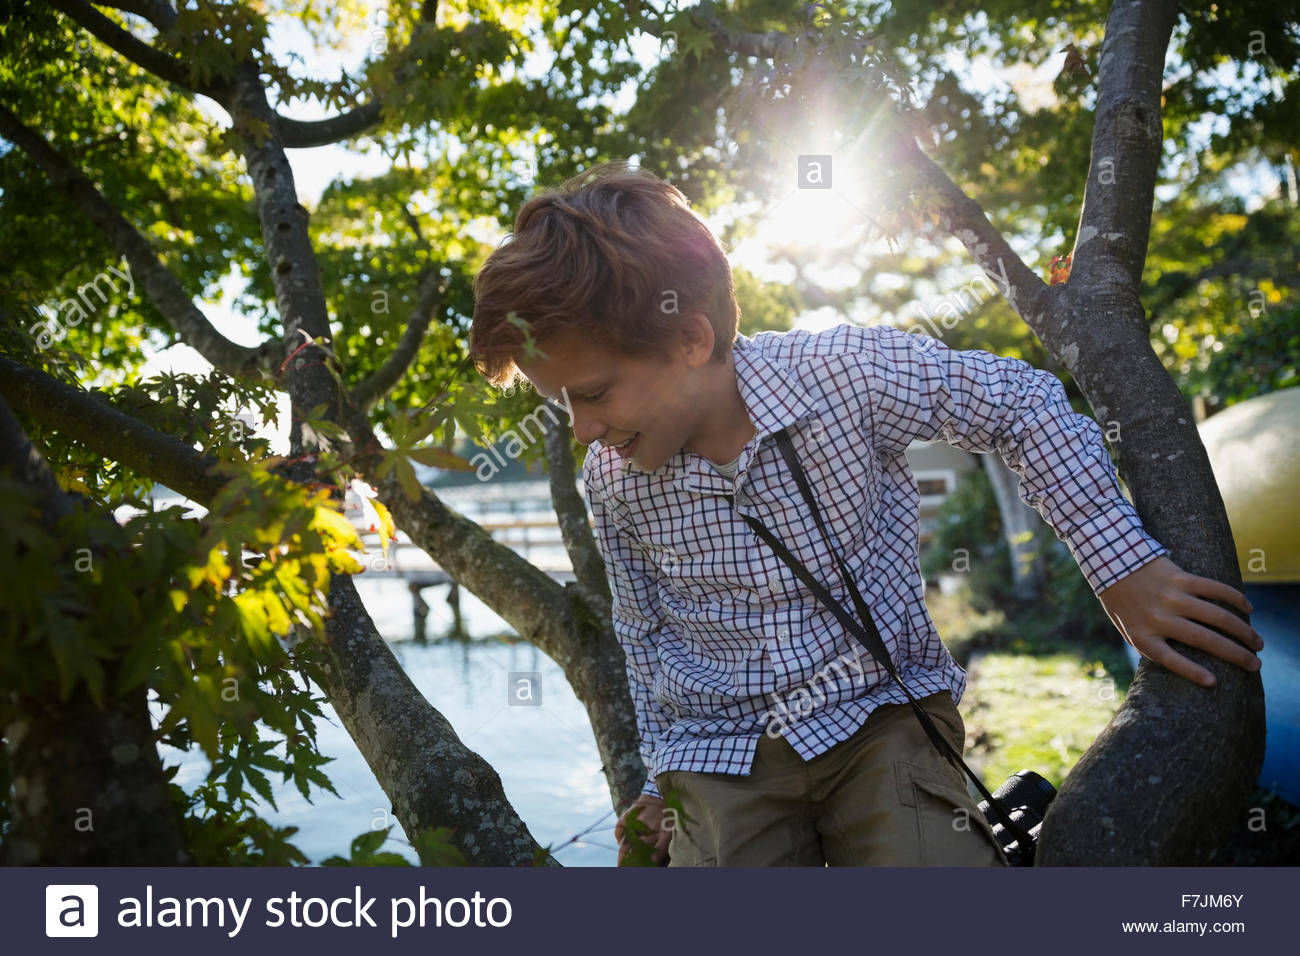 Boy climbing tree - Stock Image